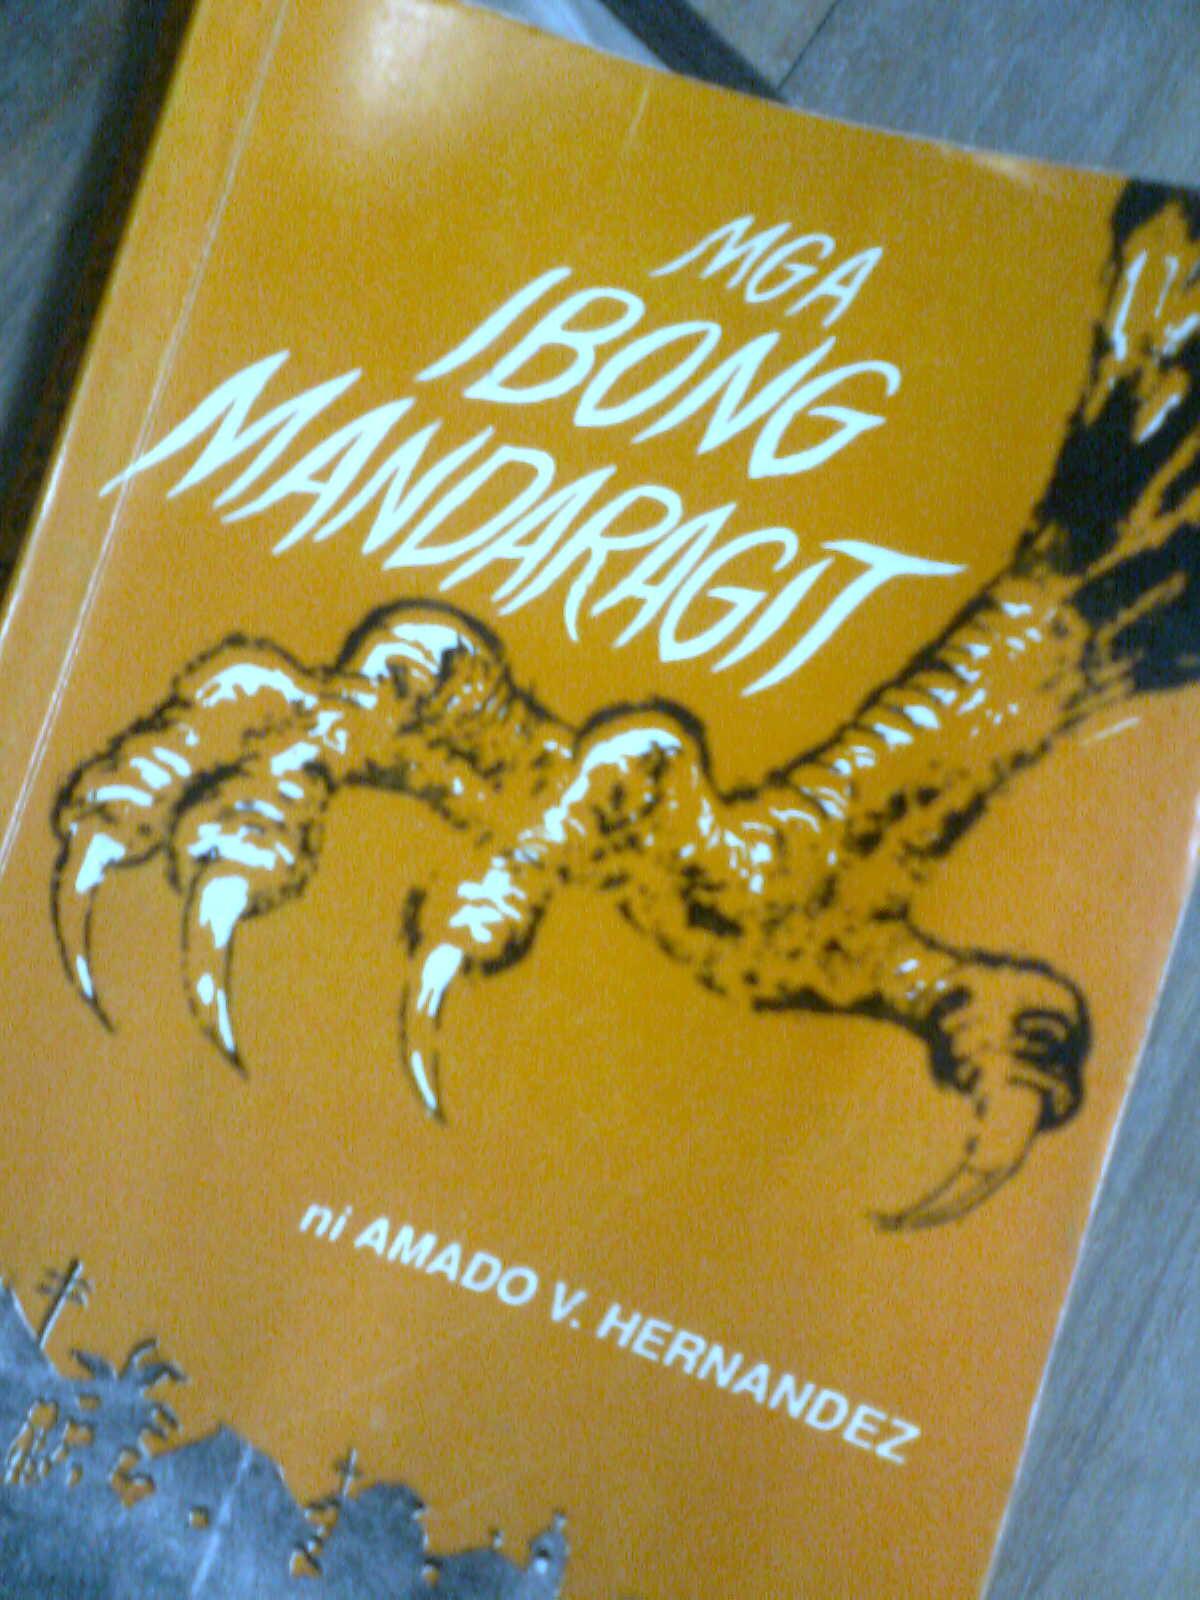 book report ng ibong mandaragit Books shelved as philippine-literature: abnkkbsnplako by bob ong, noli me tángere by josé rizal, alamat ng gubat by bob ong  mga ibong mandaragit.